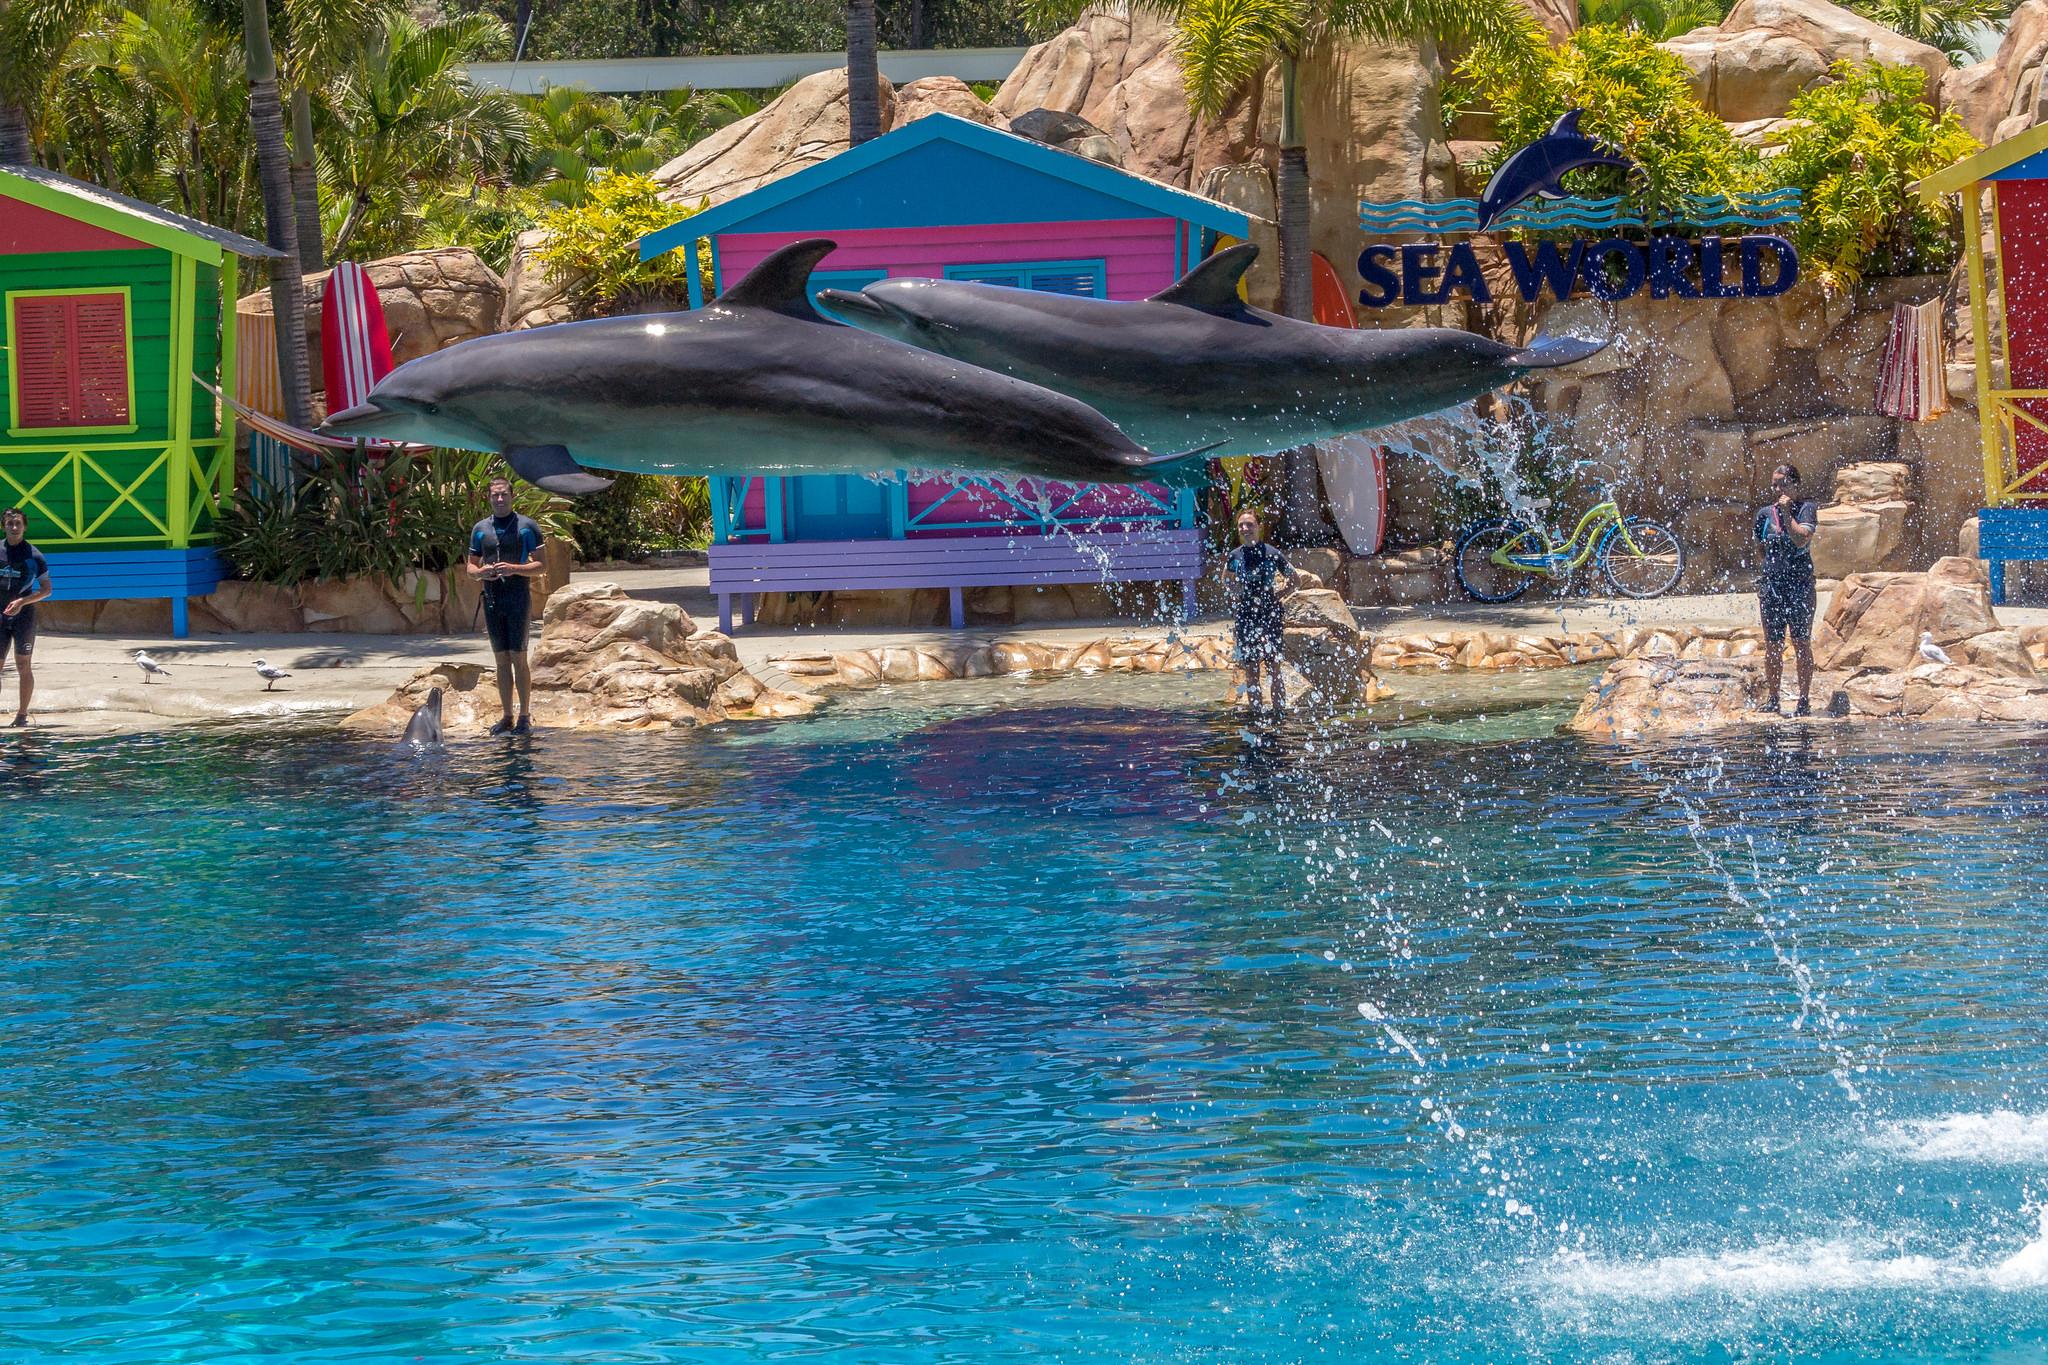 Affinity Dolphin Show - Sea World Gold Coast, Australia